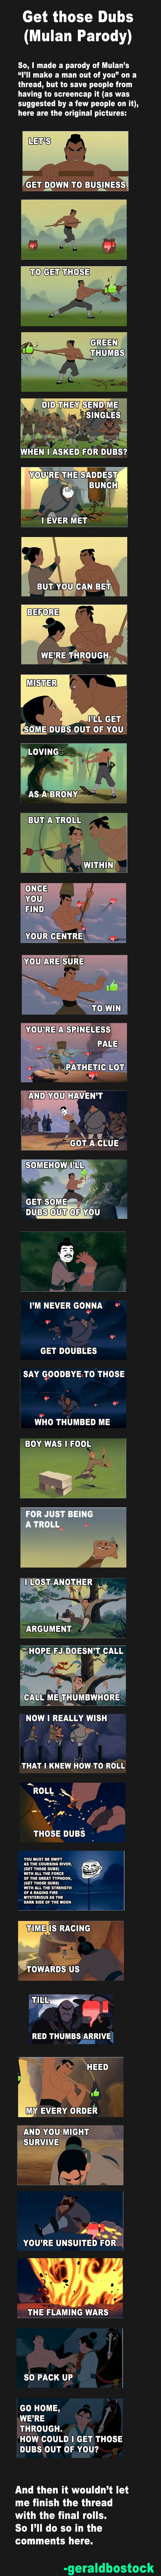 Get those dubs (Mulan parody). Link to original thread: www.funnyjunk.com/funny_pictures/2933826/Zodiac+Signs/405#405 A realisation: funnyjunk.com/funny_picture